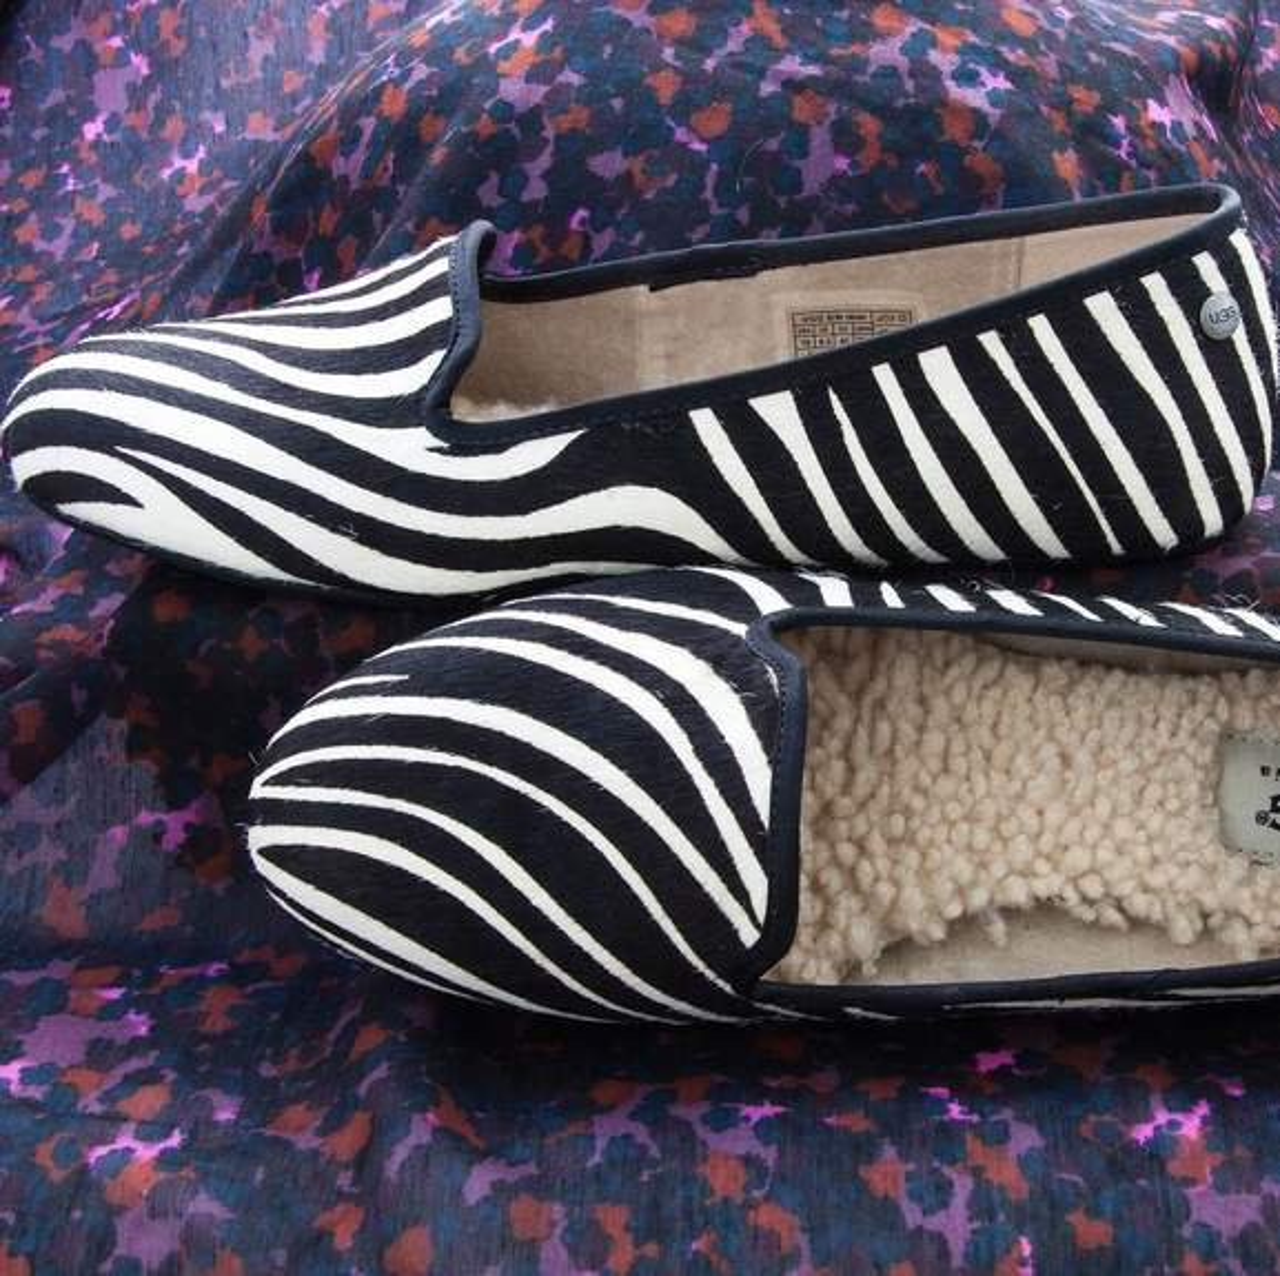 Zebra striped ugg slippers